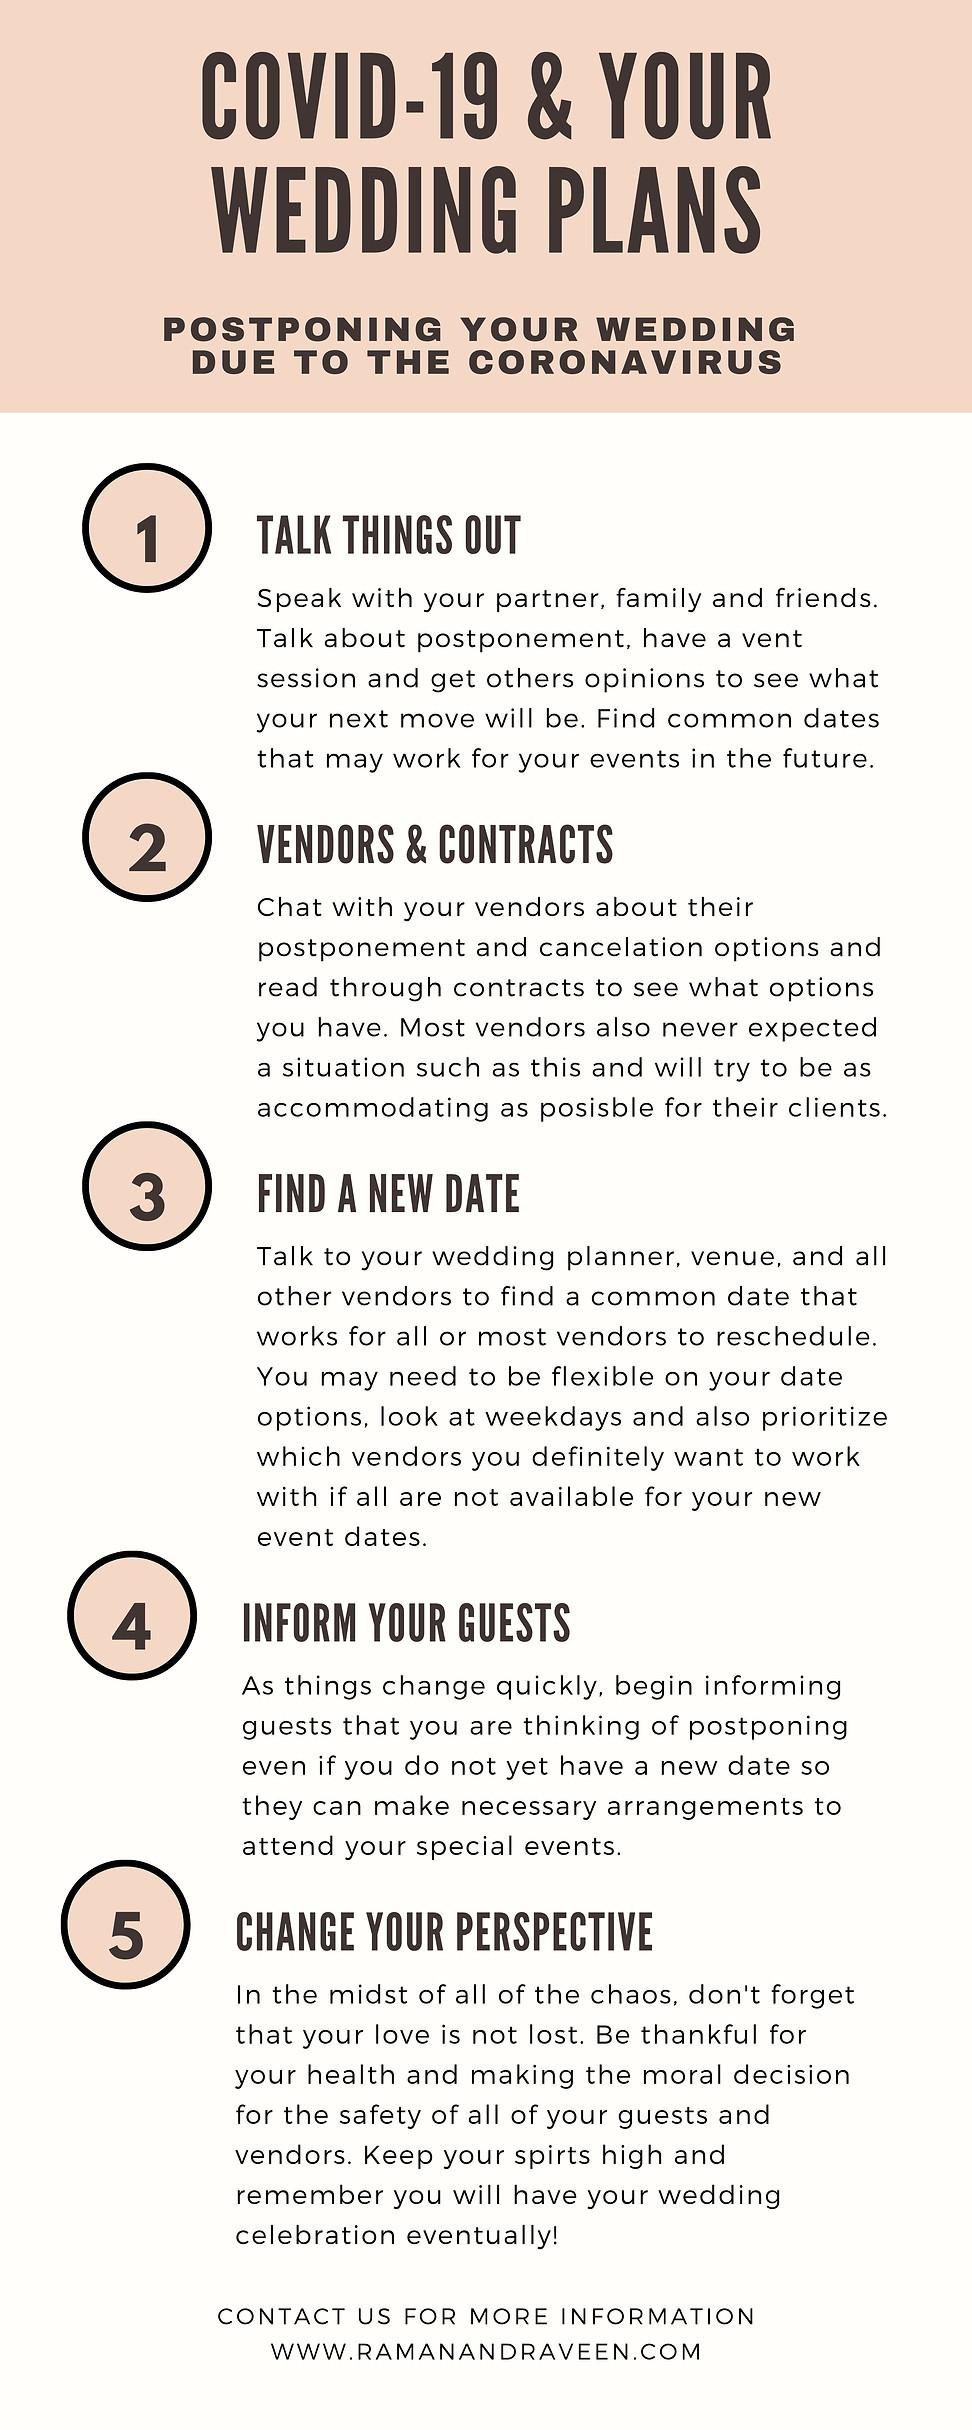 COVID-19 & Your Wedding Plans (2).jpg